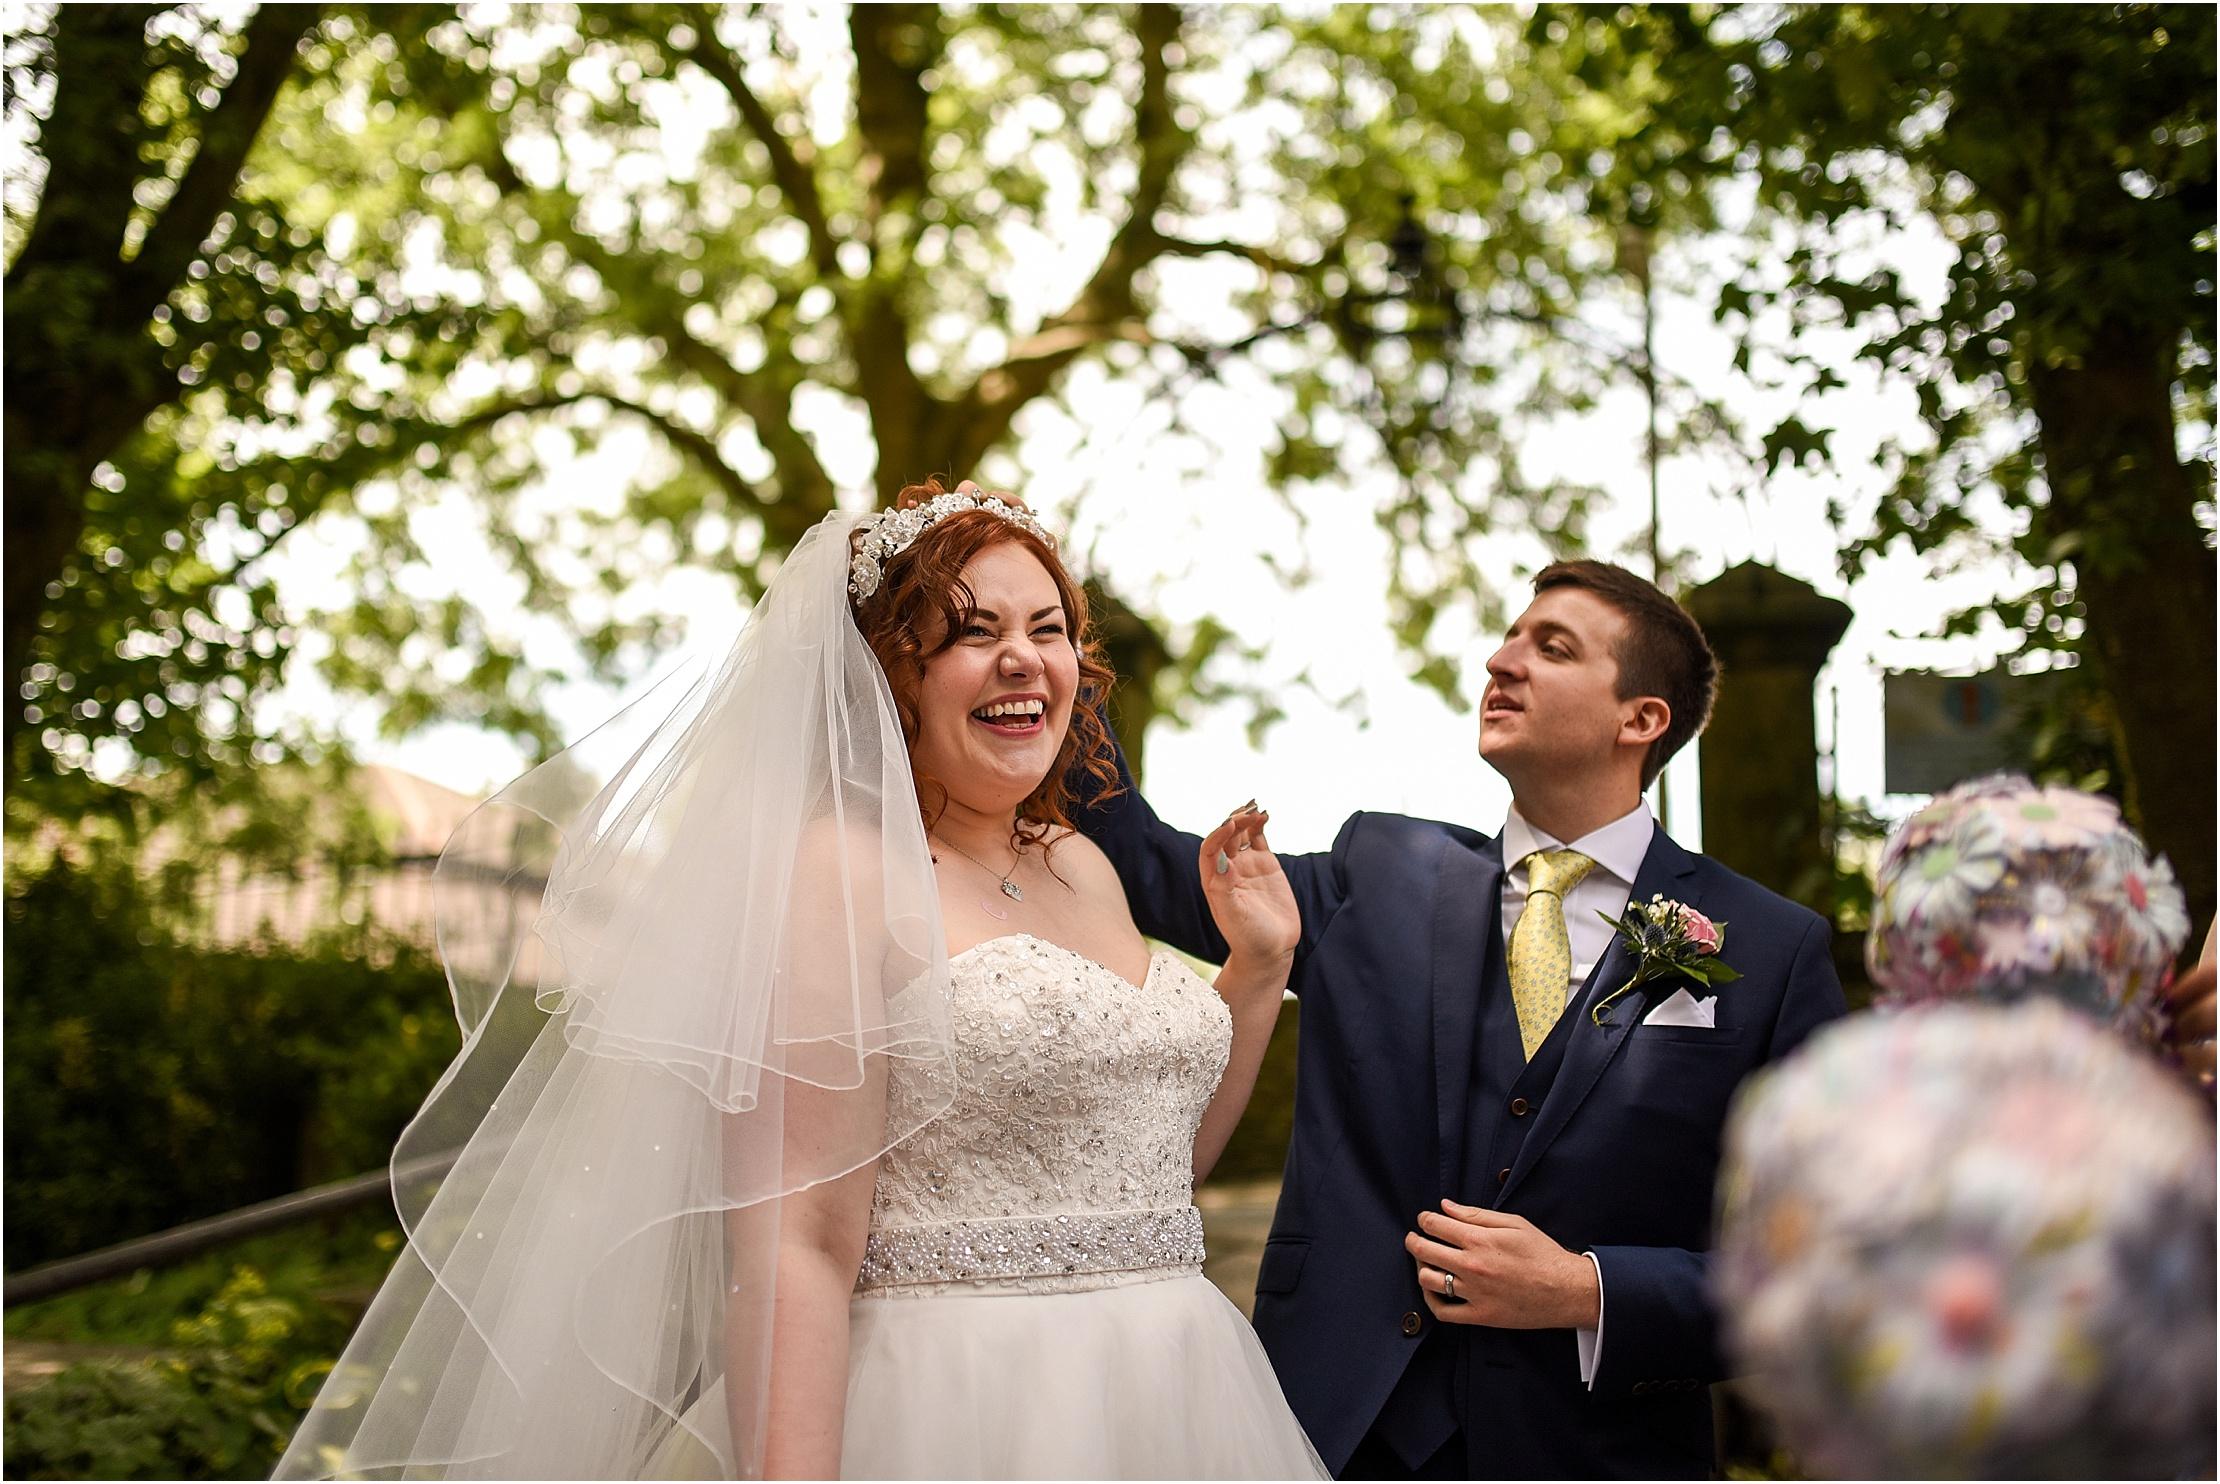 shireburn-arms-wedding- 069.jpg